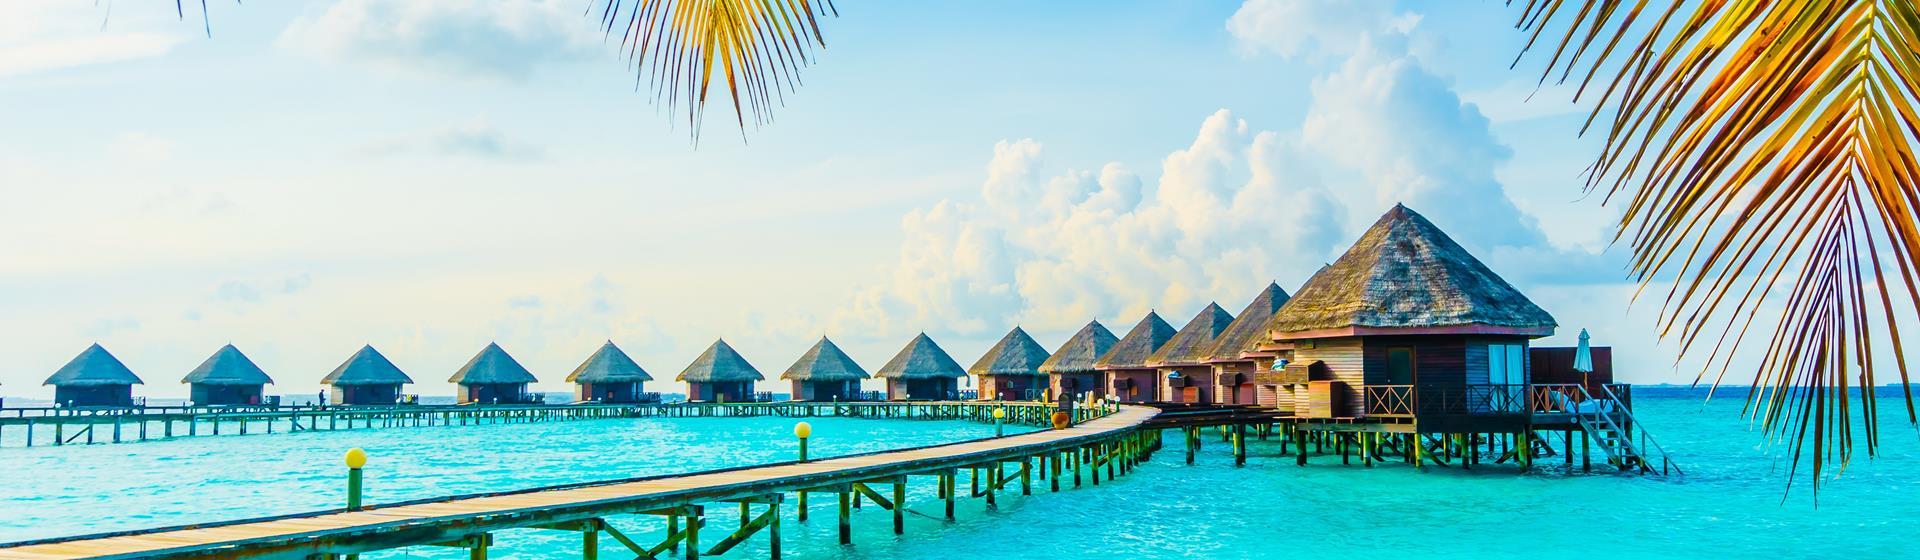 Maldives Holidays Honeymoons 2020 Cheap Holidays To The